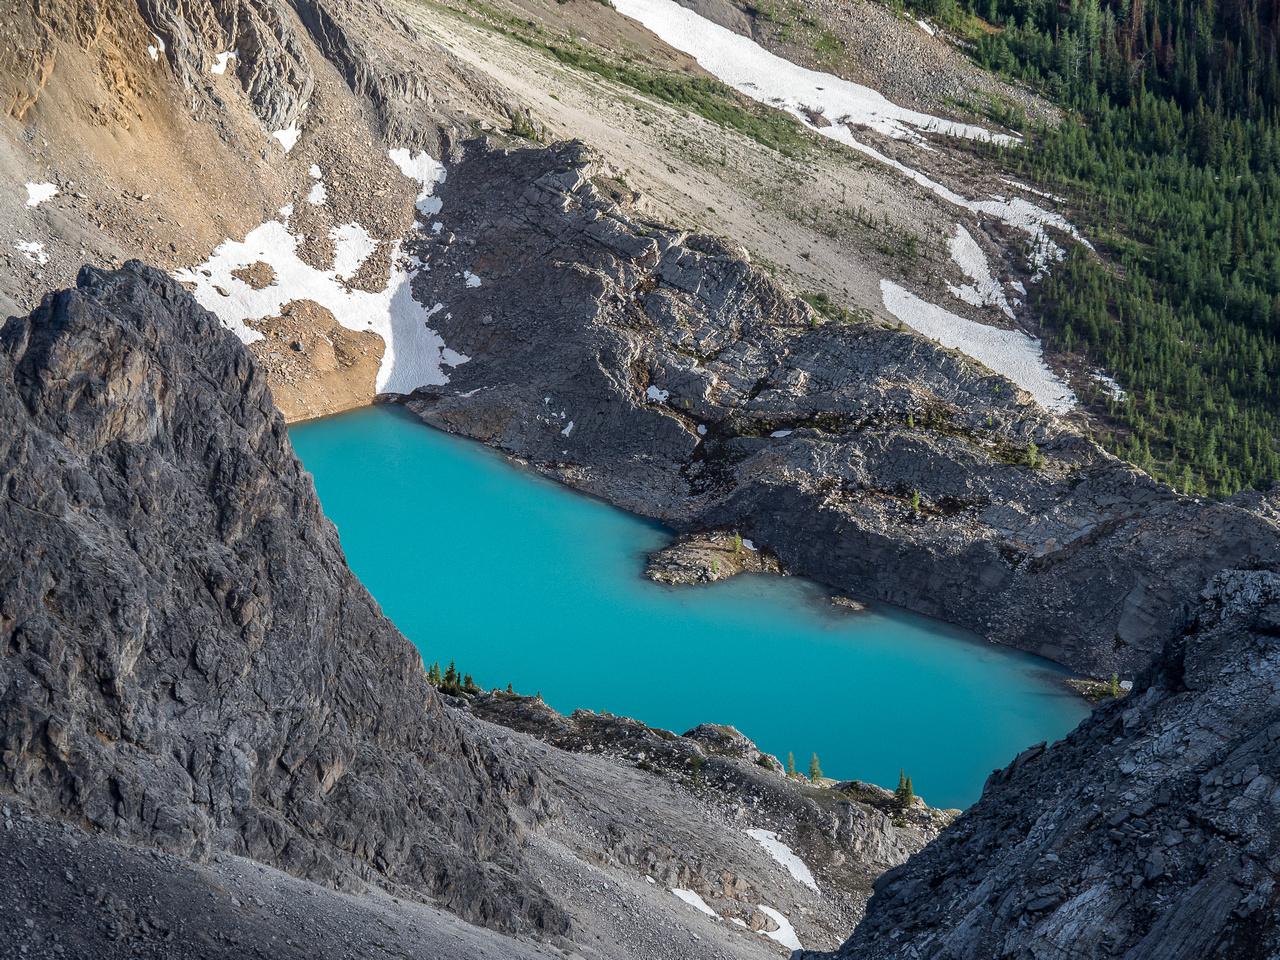 Nestor Lake is a real backcountry gem.